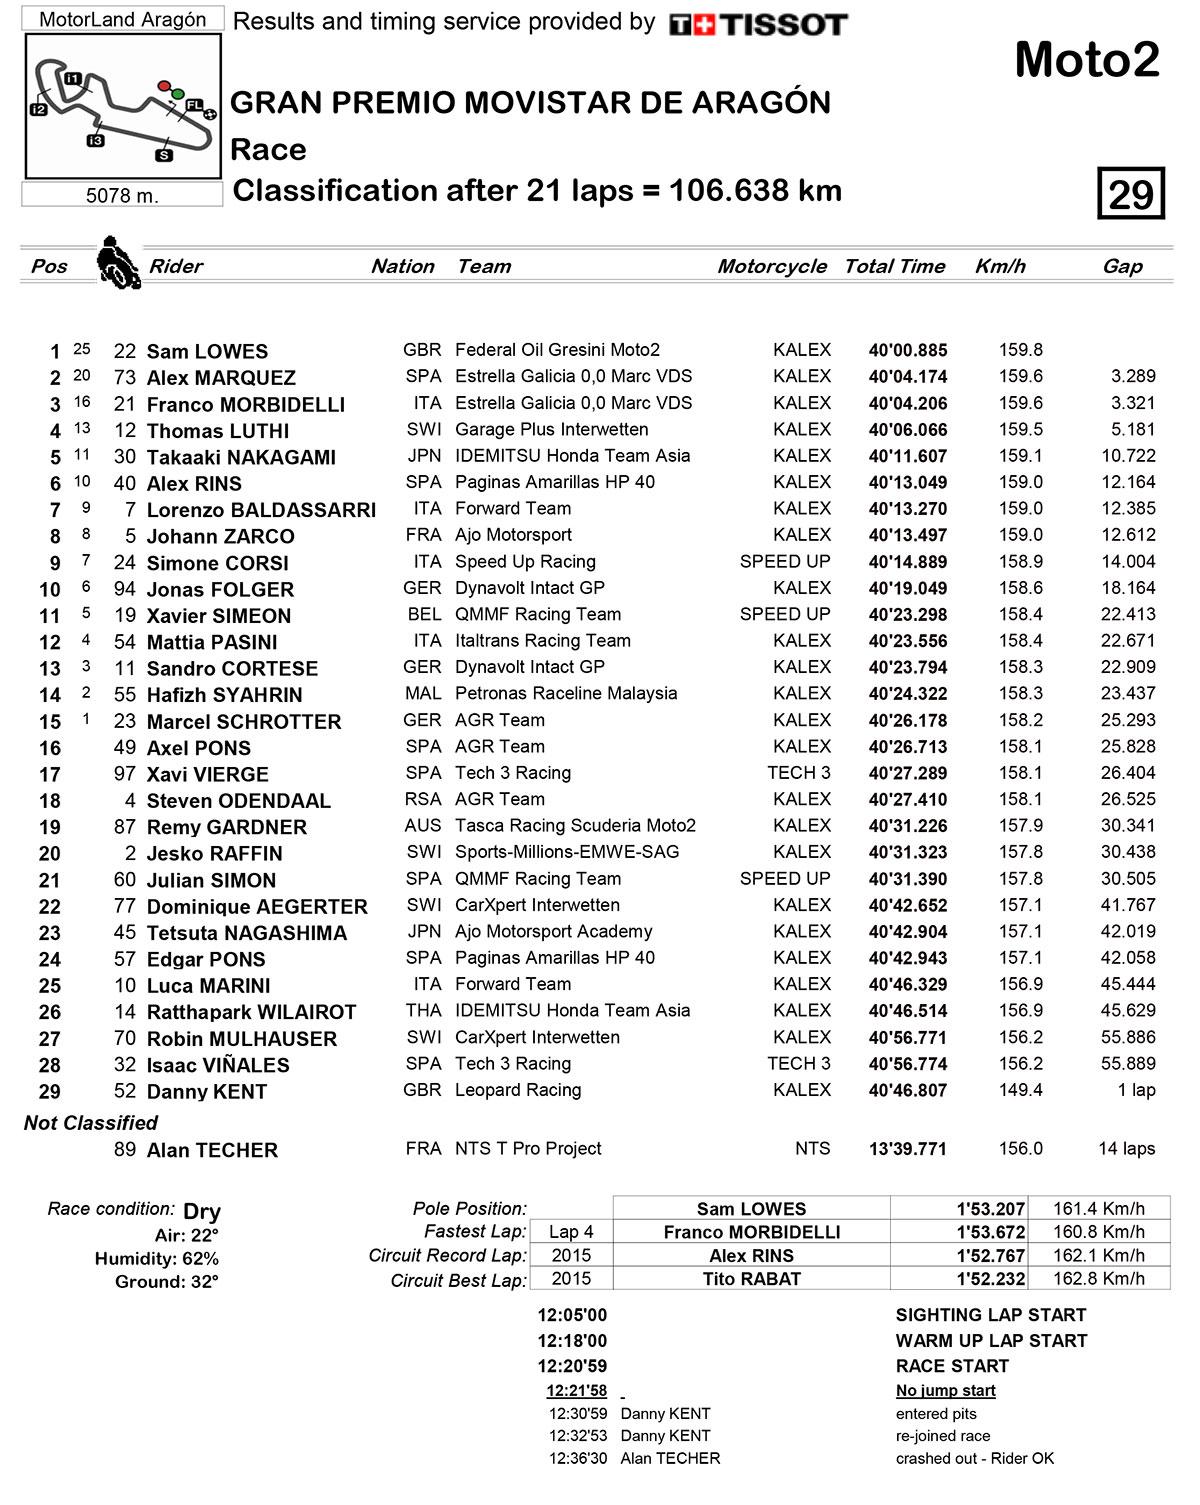 moto2-classification